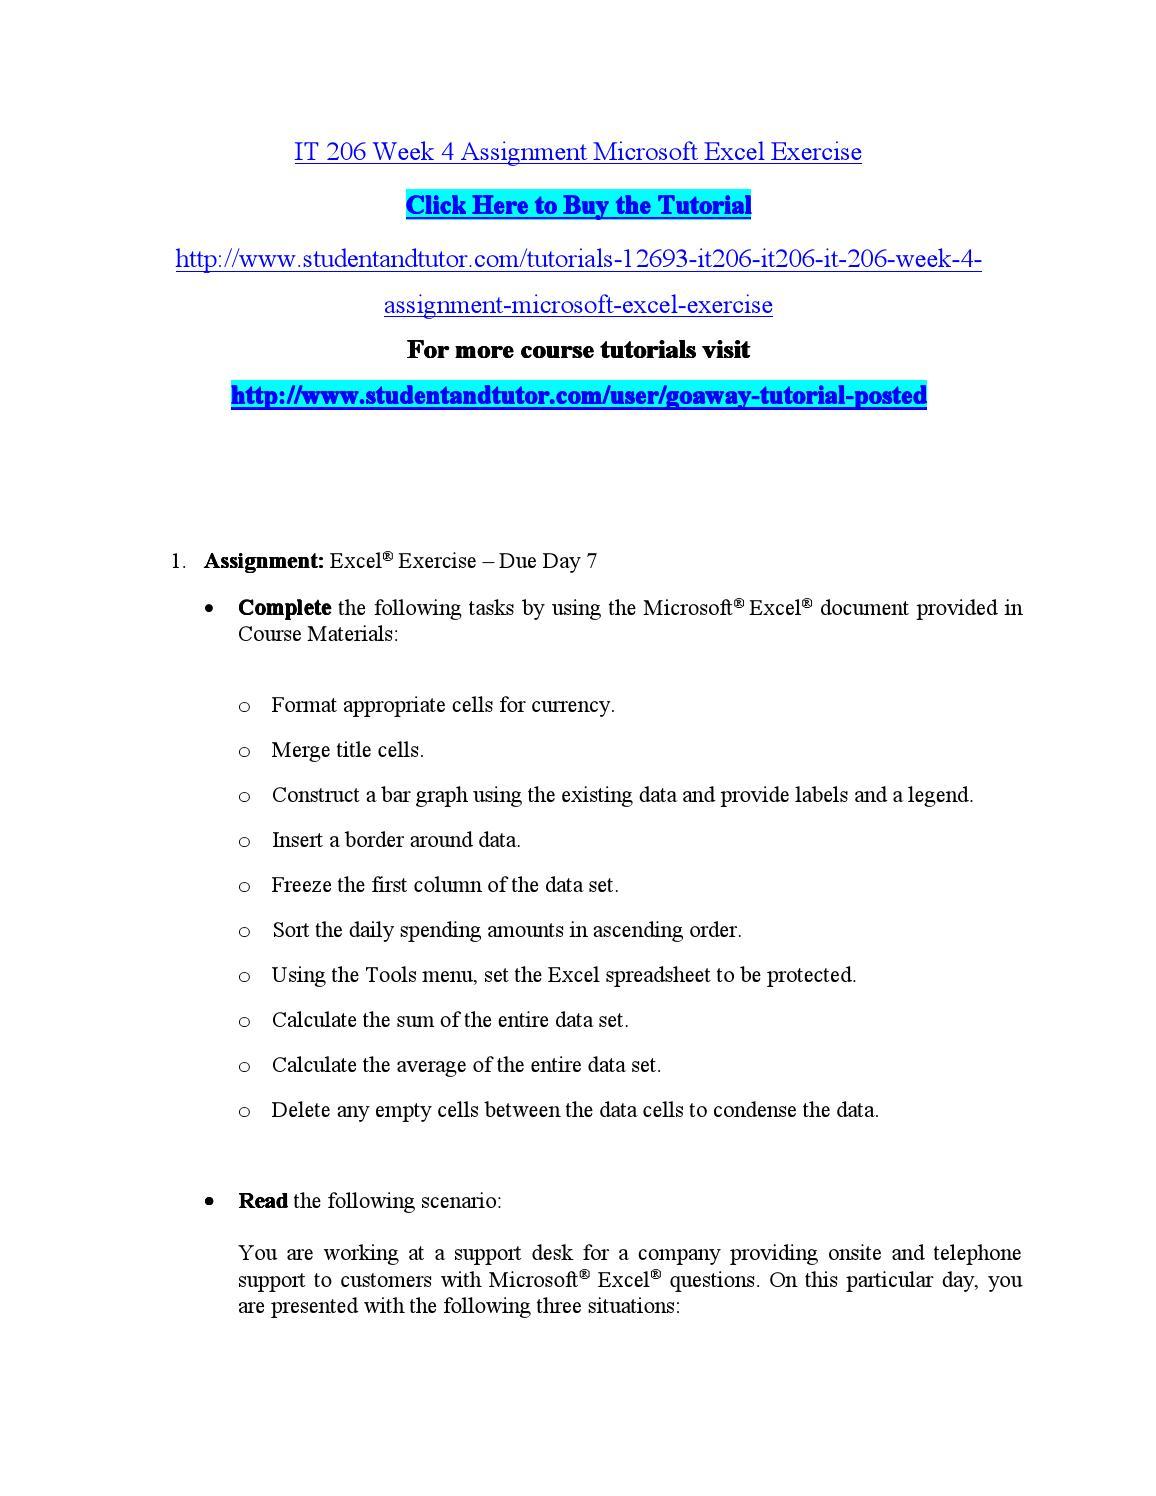 PSHE Scenarios- Group problem solving activity